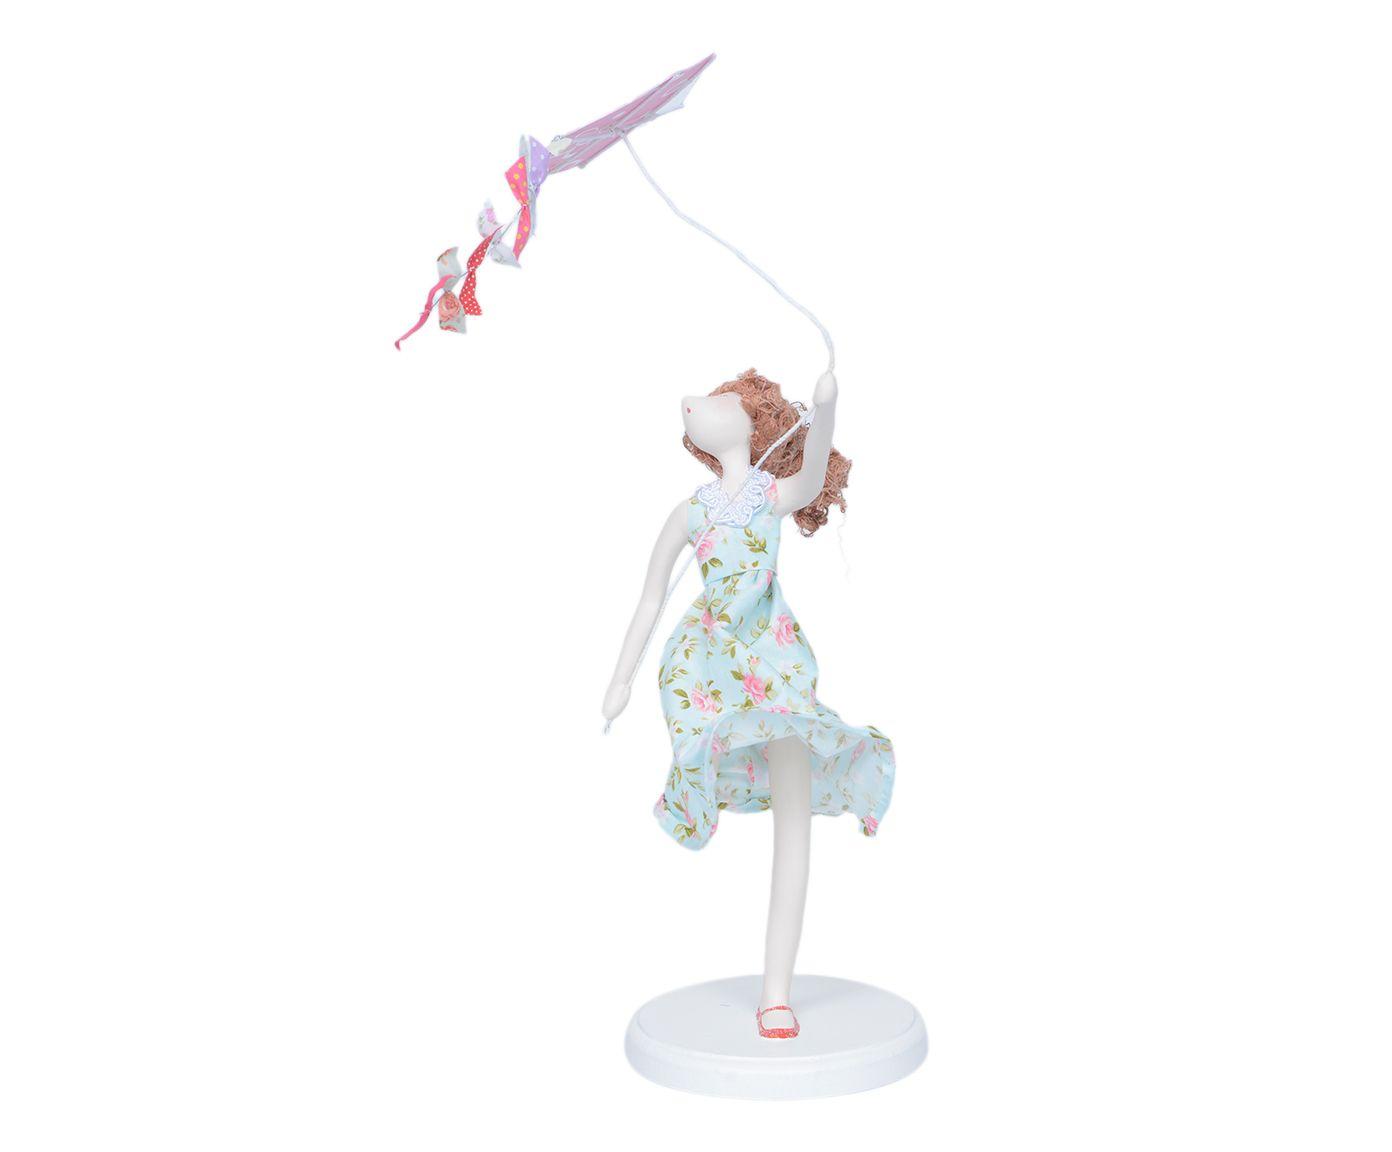 Escultura Menina com Pipa   Westwing.com.br